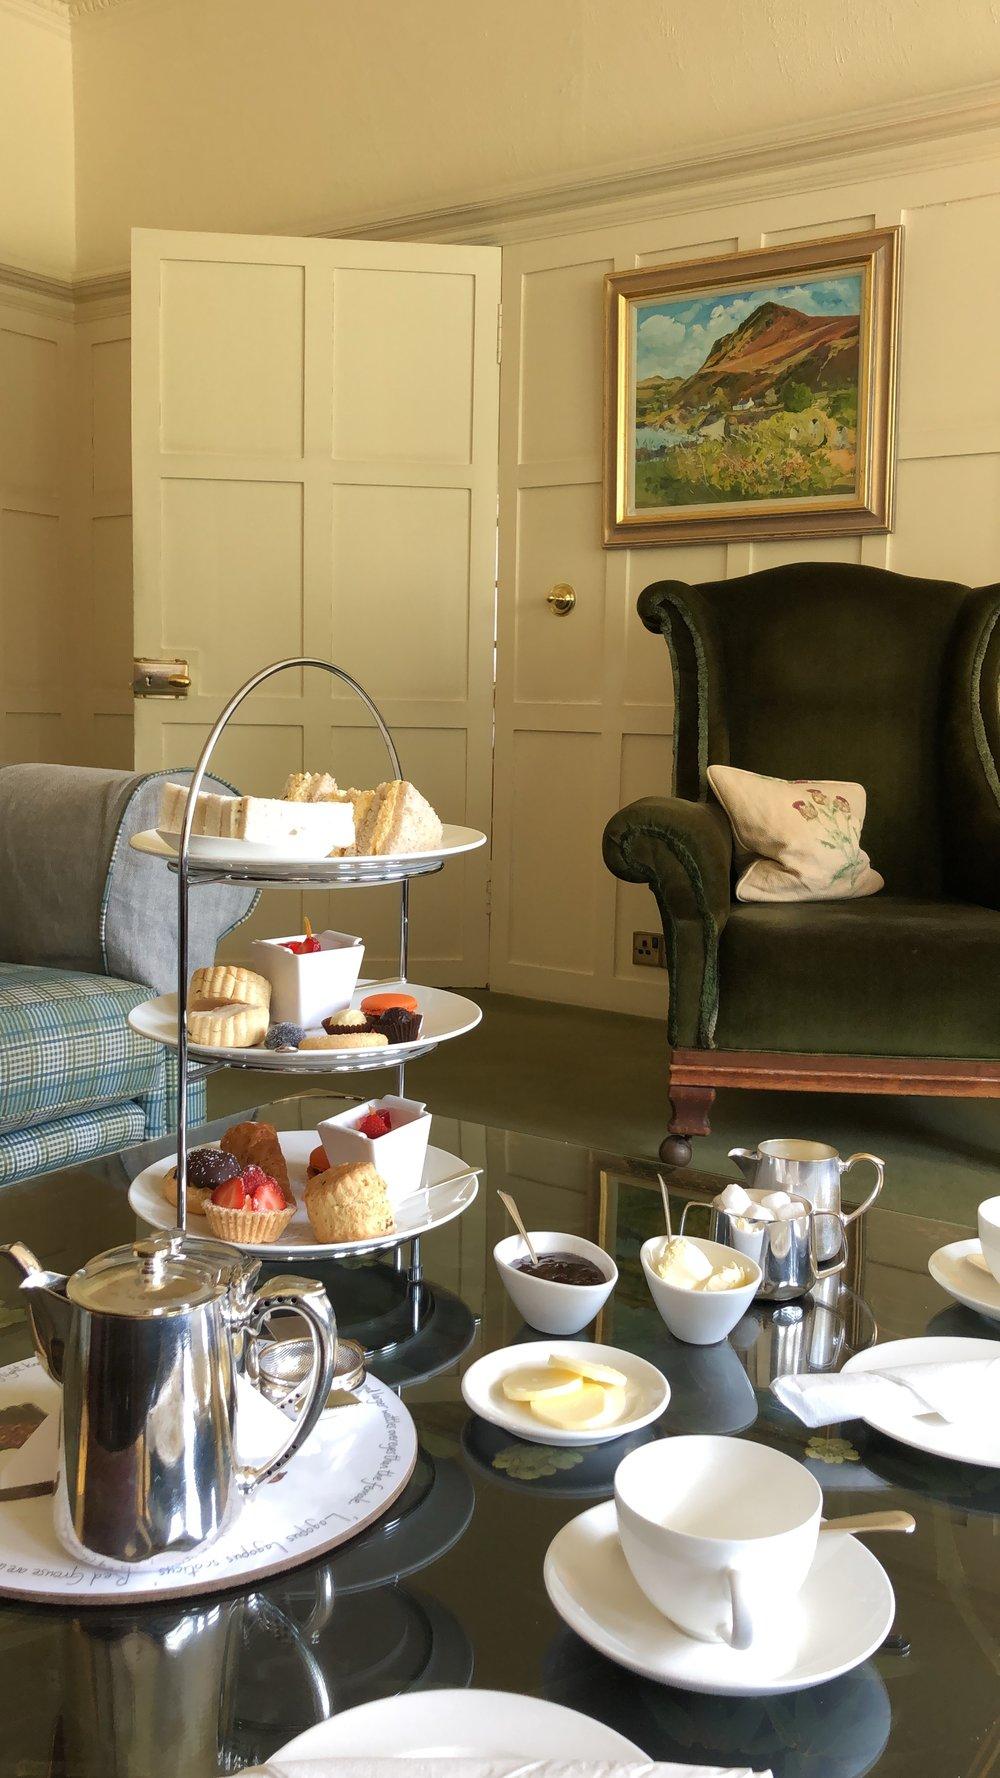 Gluten free afternoon tea in Knockinaam Lodge